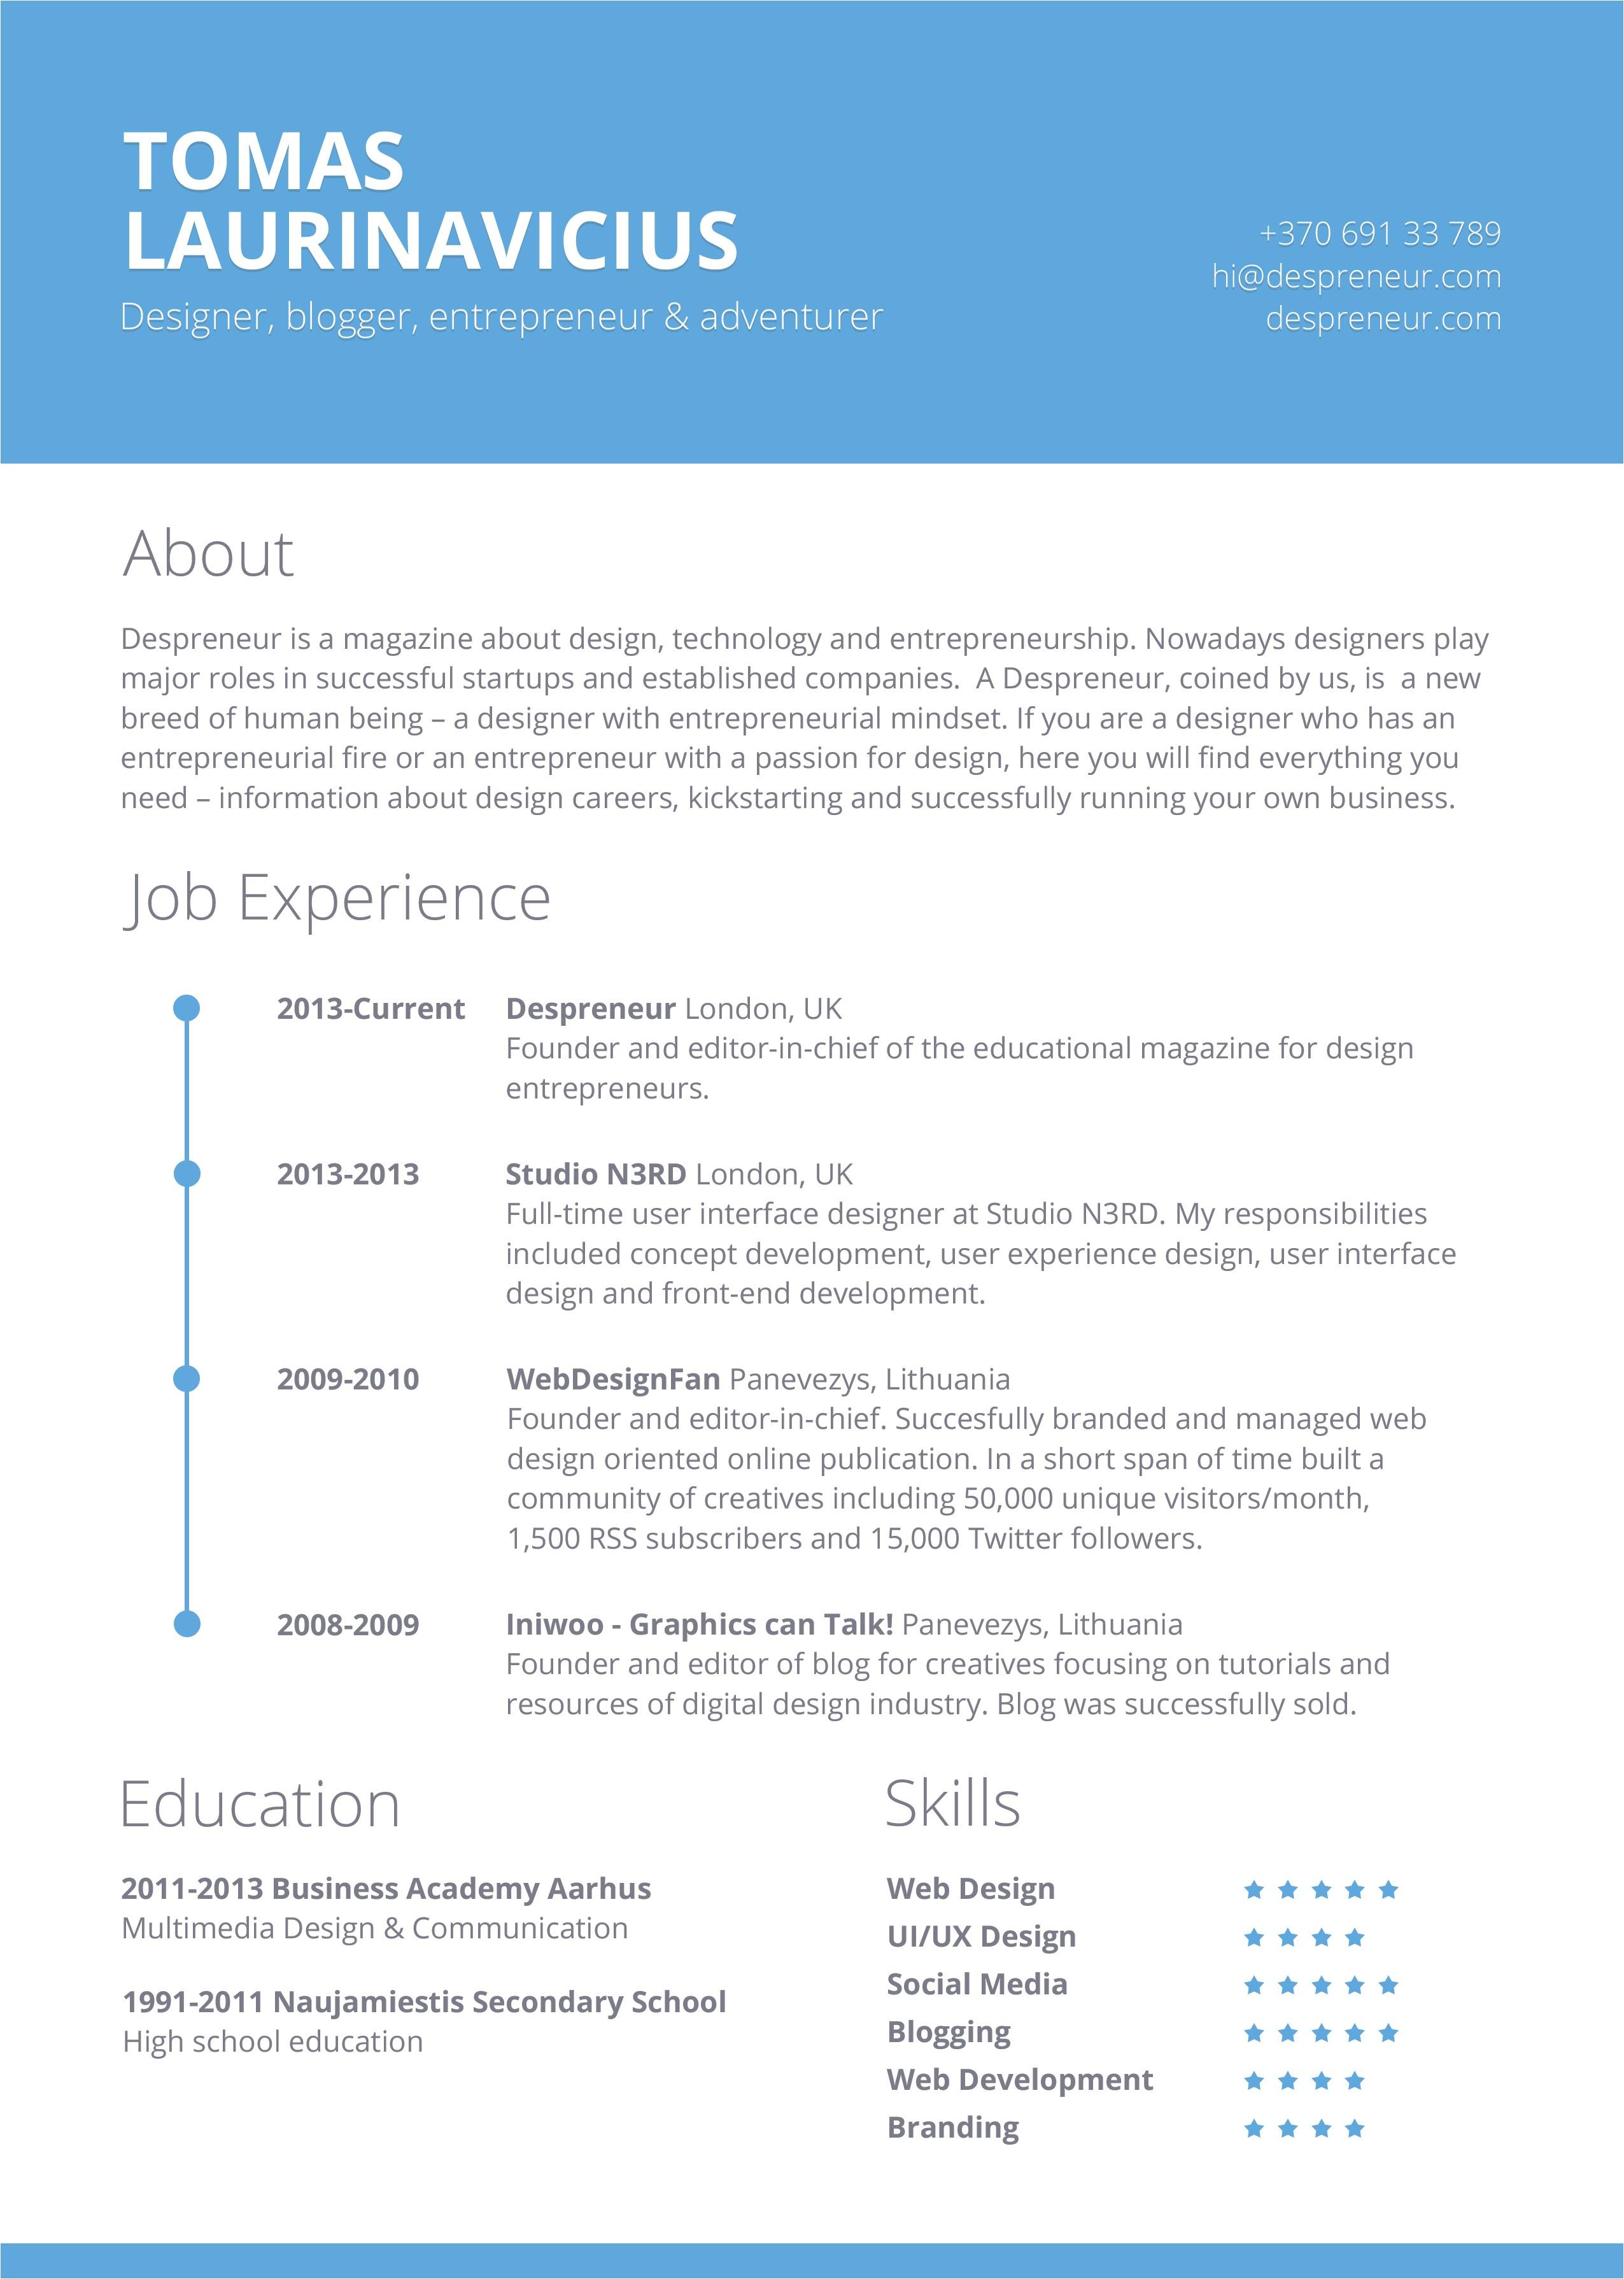 Free Resume format Template 40 Resume Template Designs Freecreatives